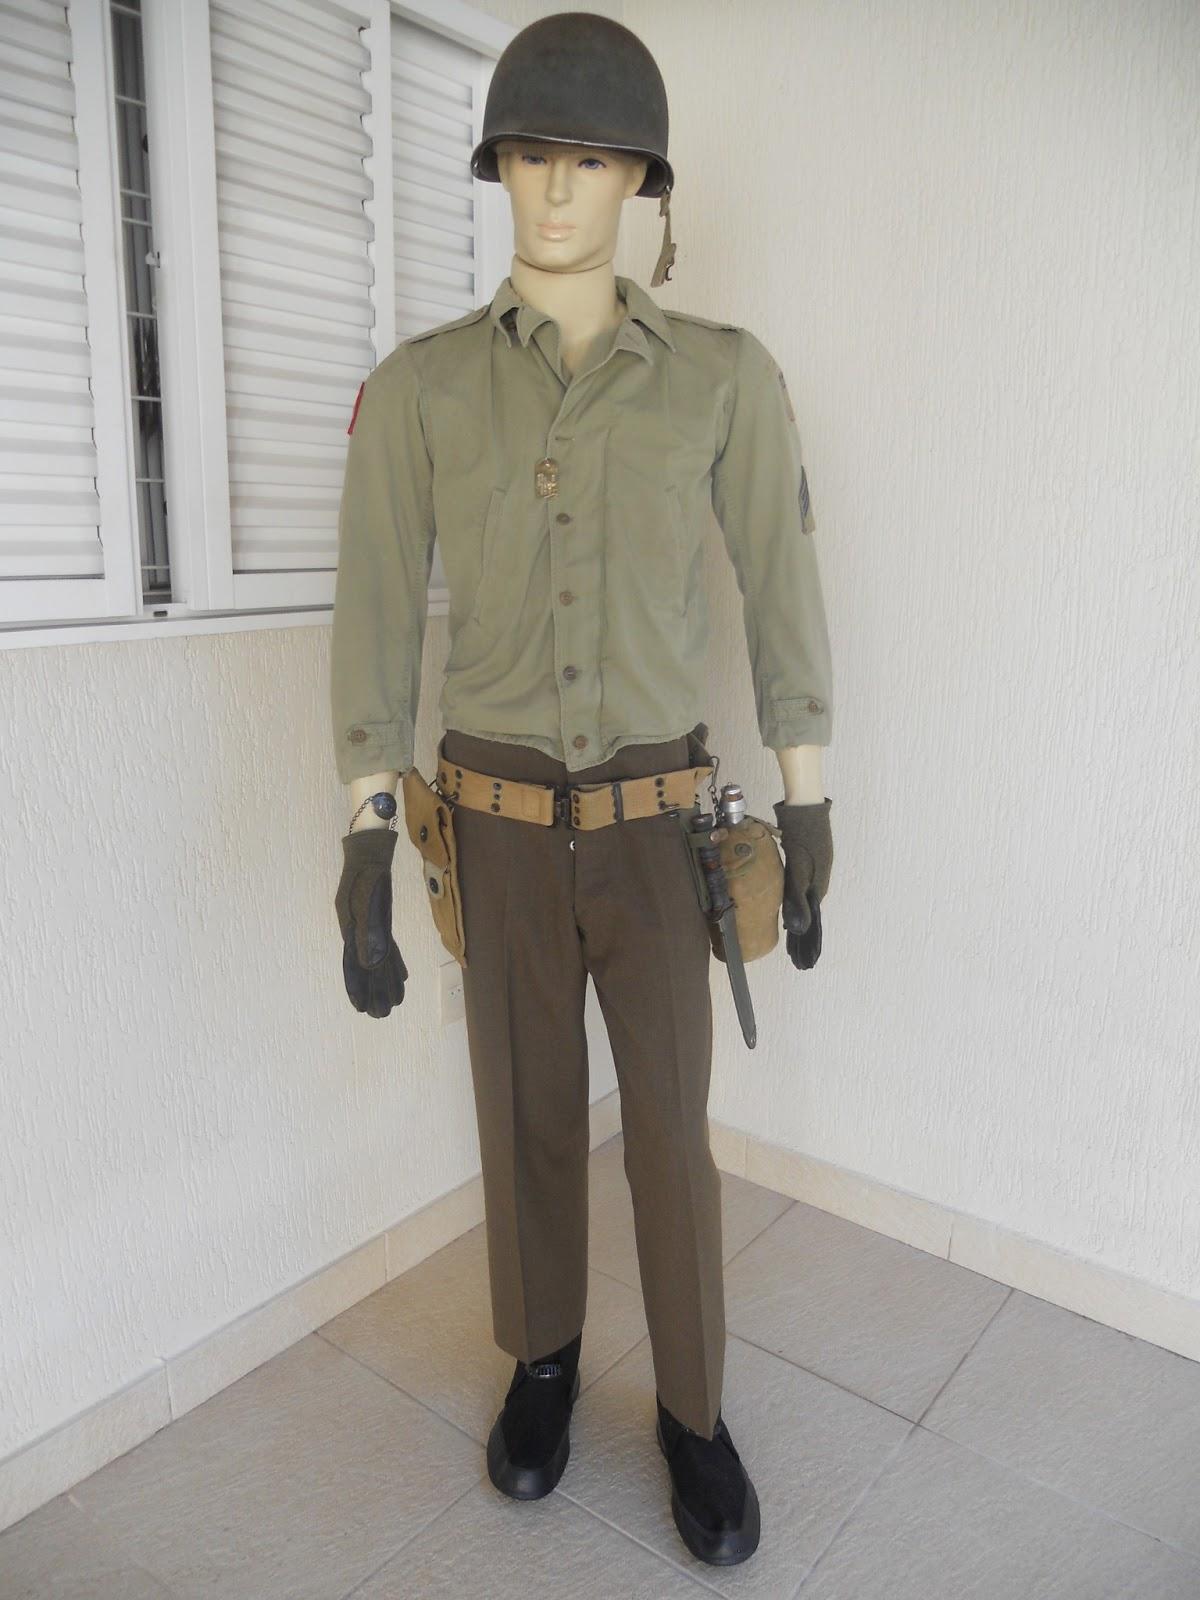 Ike Jacket